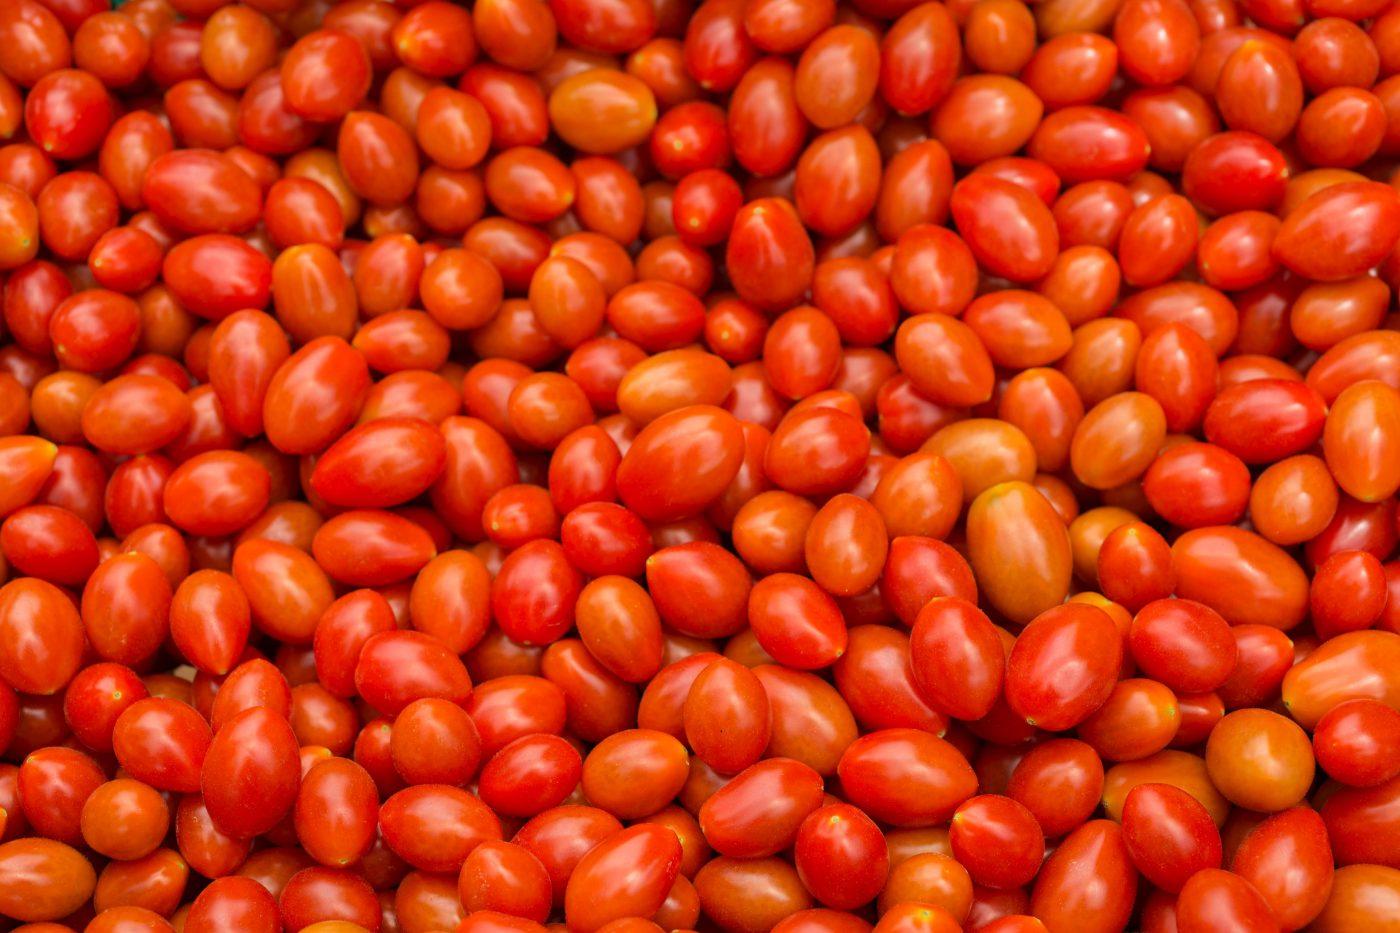 Sicilian Pesto - Follow our recipe